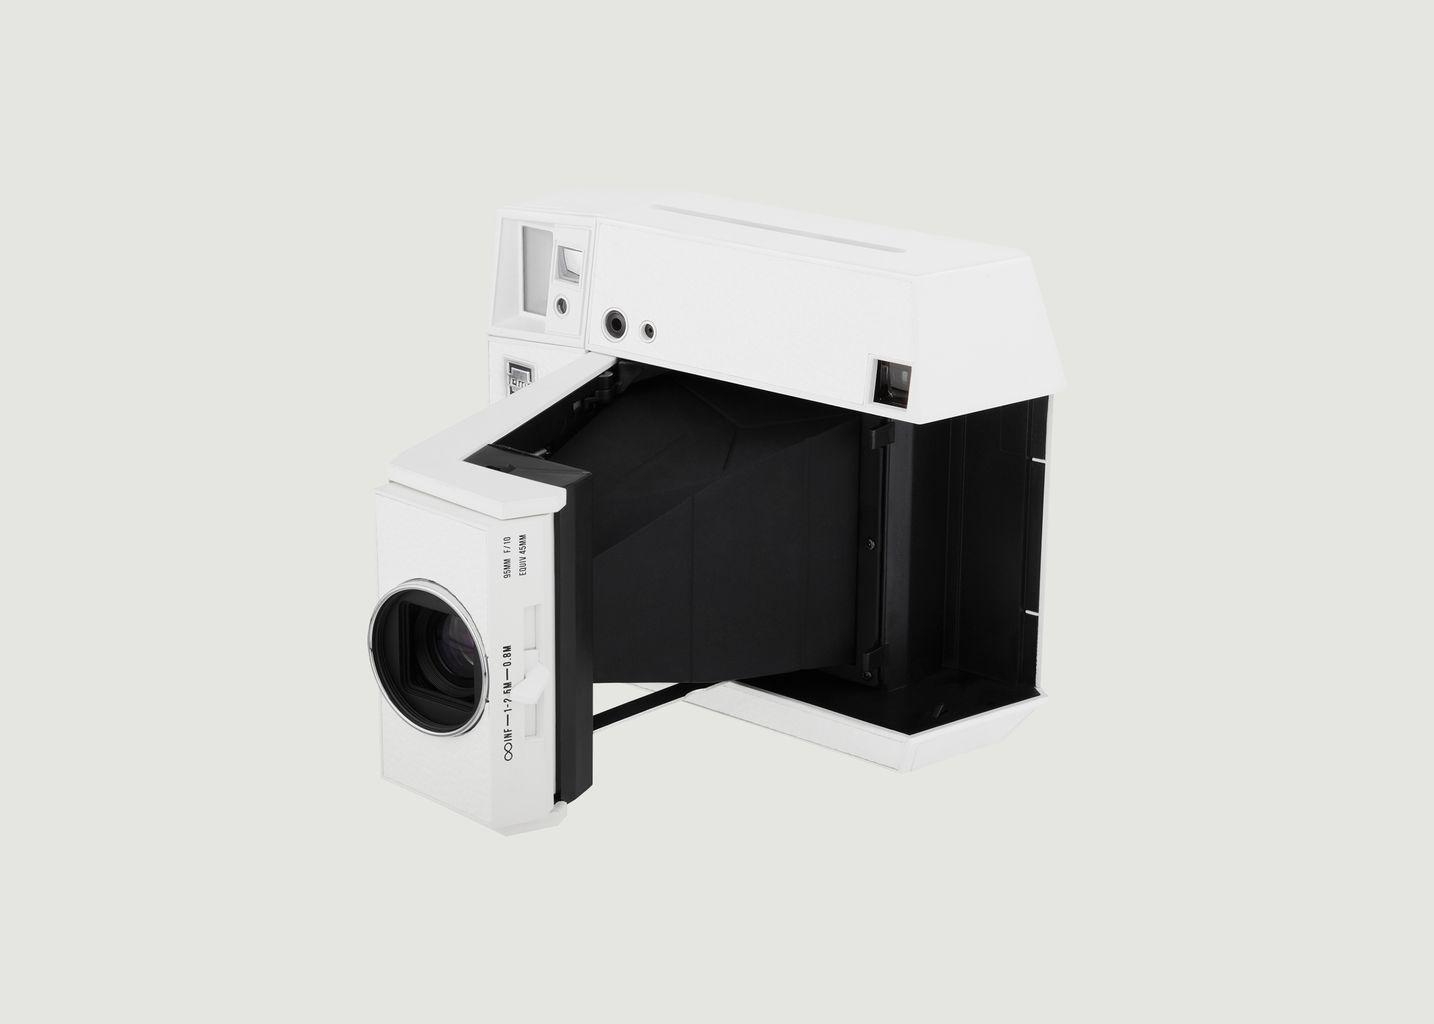 Lomoinstant Square Camera Combo White Edition Lomography Instant Sanremo